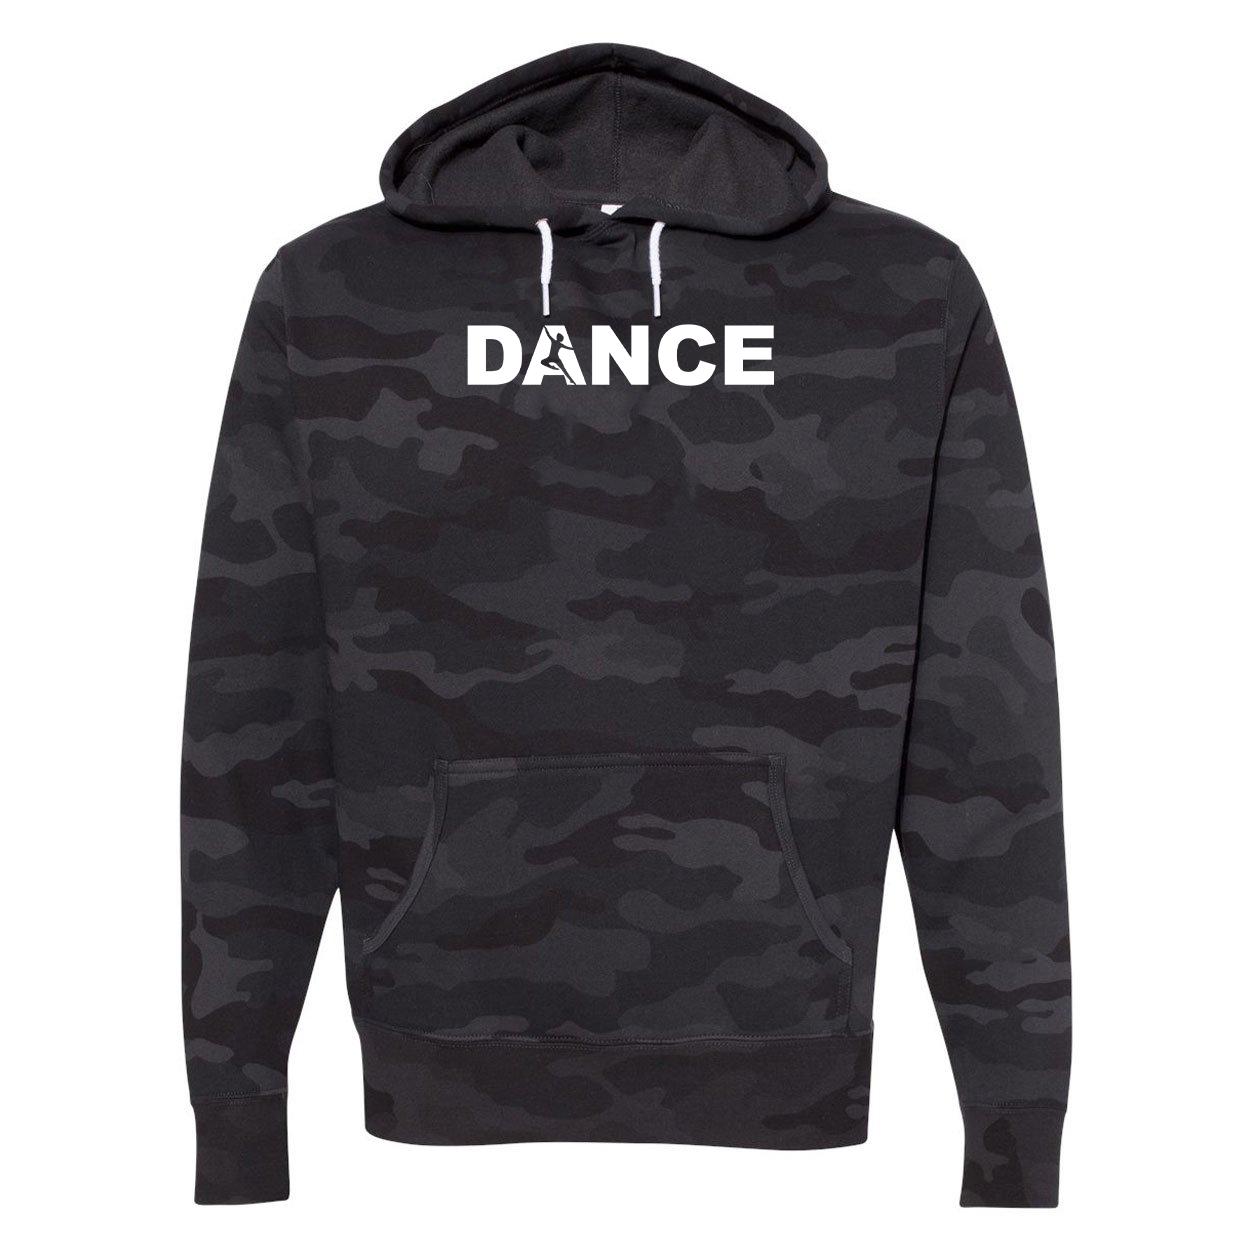 Dance Silhouette Logo Classic Unisex Hooded Sweatshirt Black Camo (White Logo)